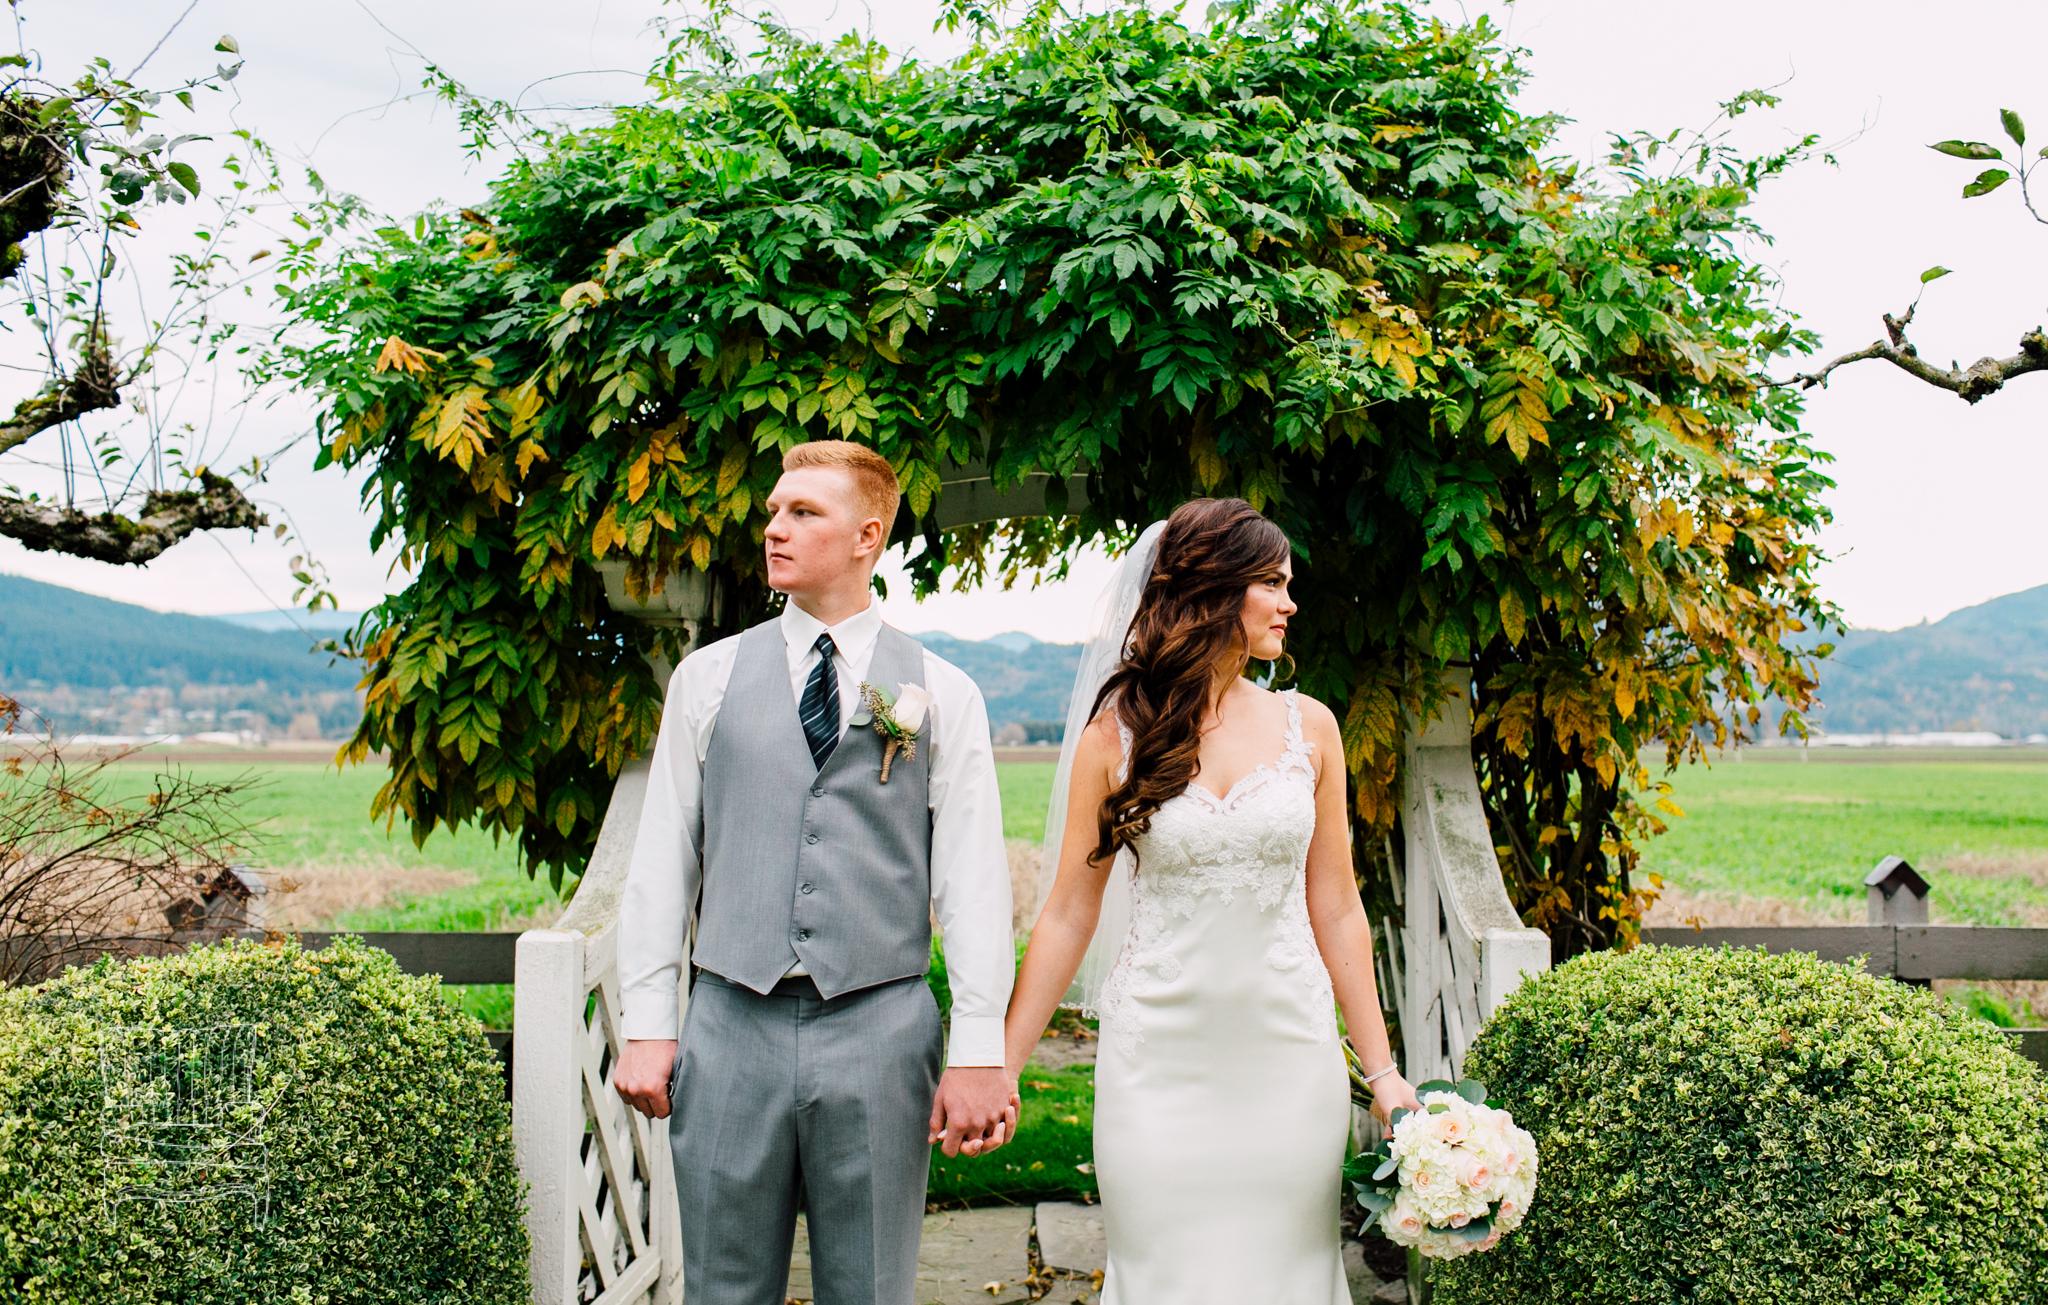 maplehurst-farm-wedding-skagit-valley-katheryn-moran-photography-14.jpg